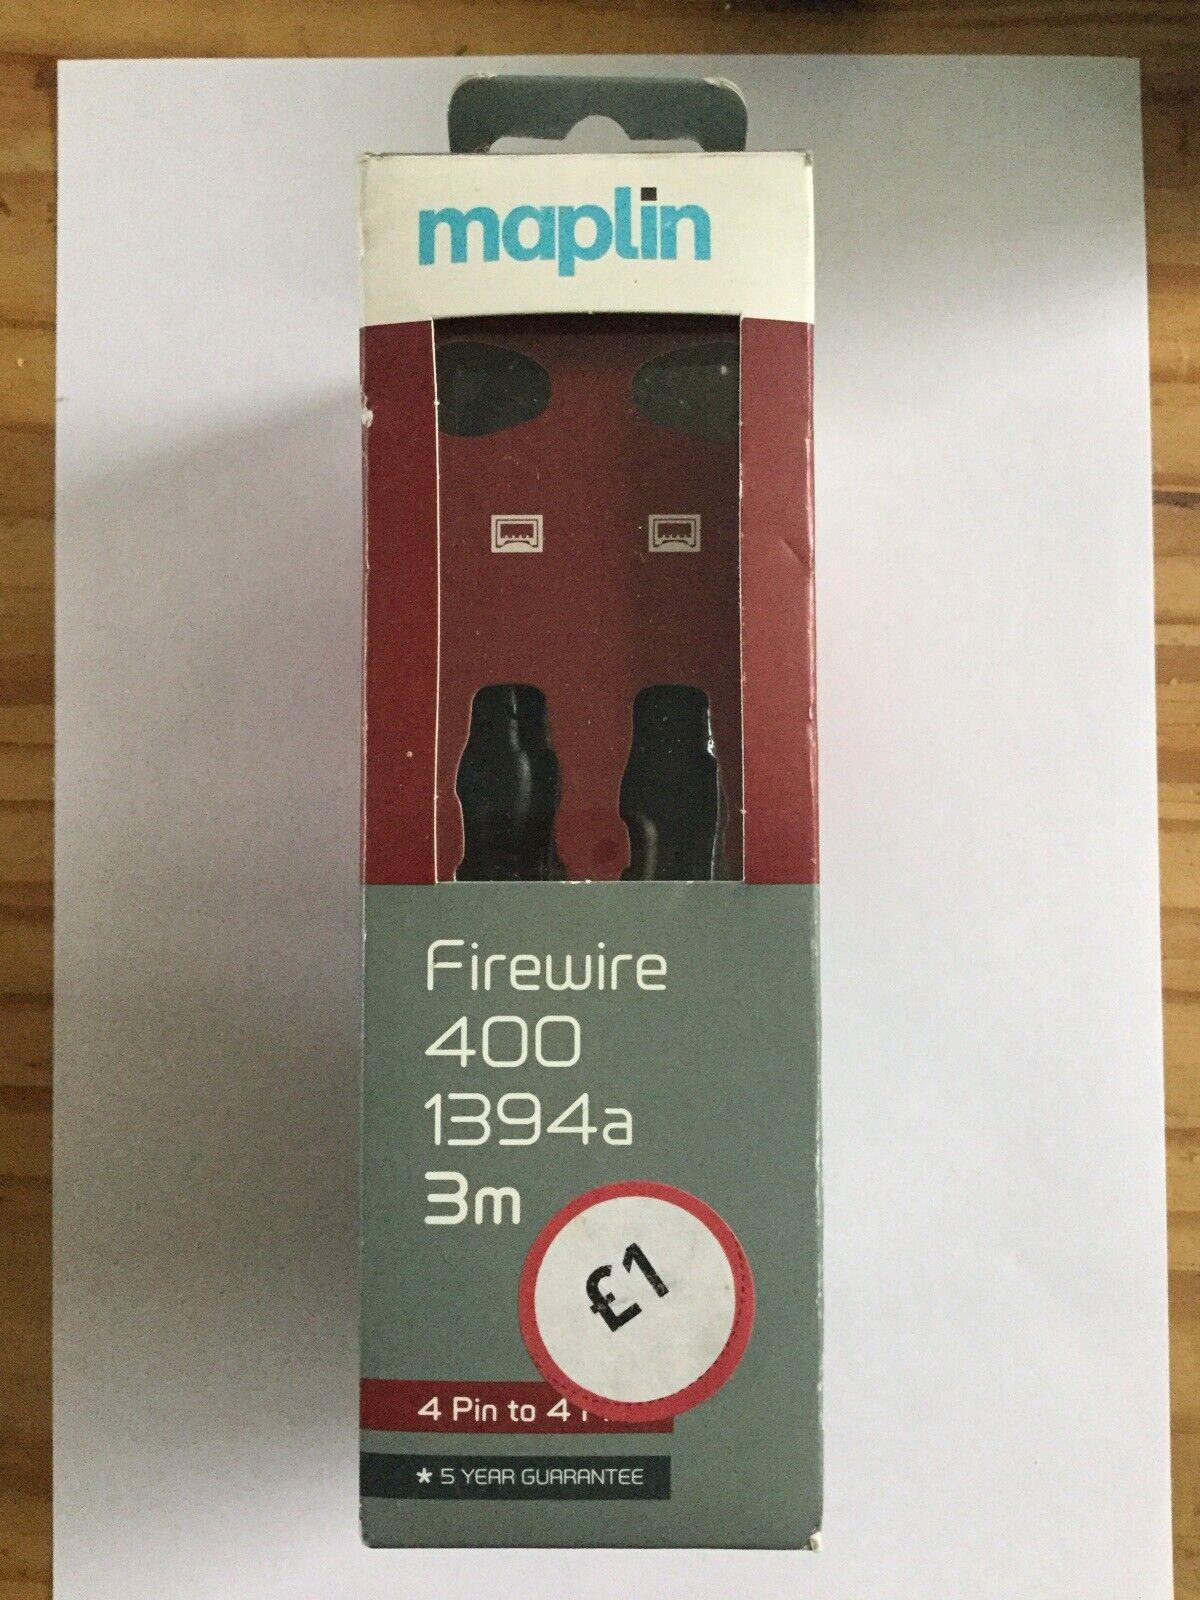 Certified Maplin Firewire 400 1394a 4 Pin To 4 Pin 3 Meters